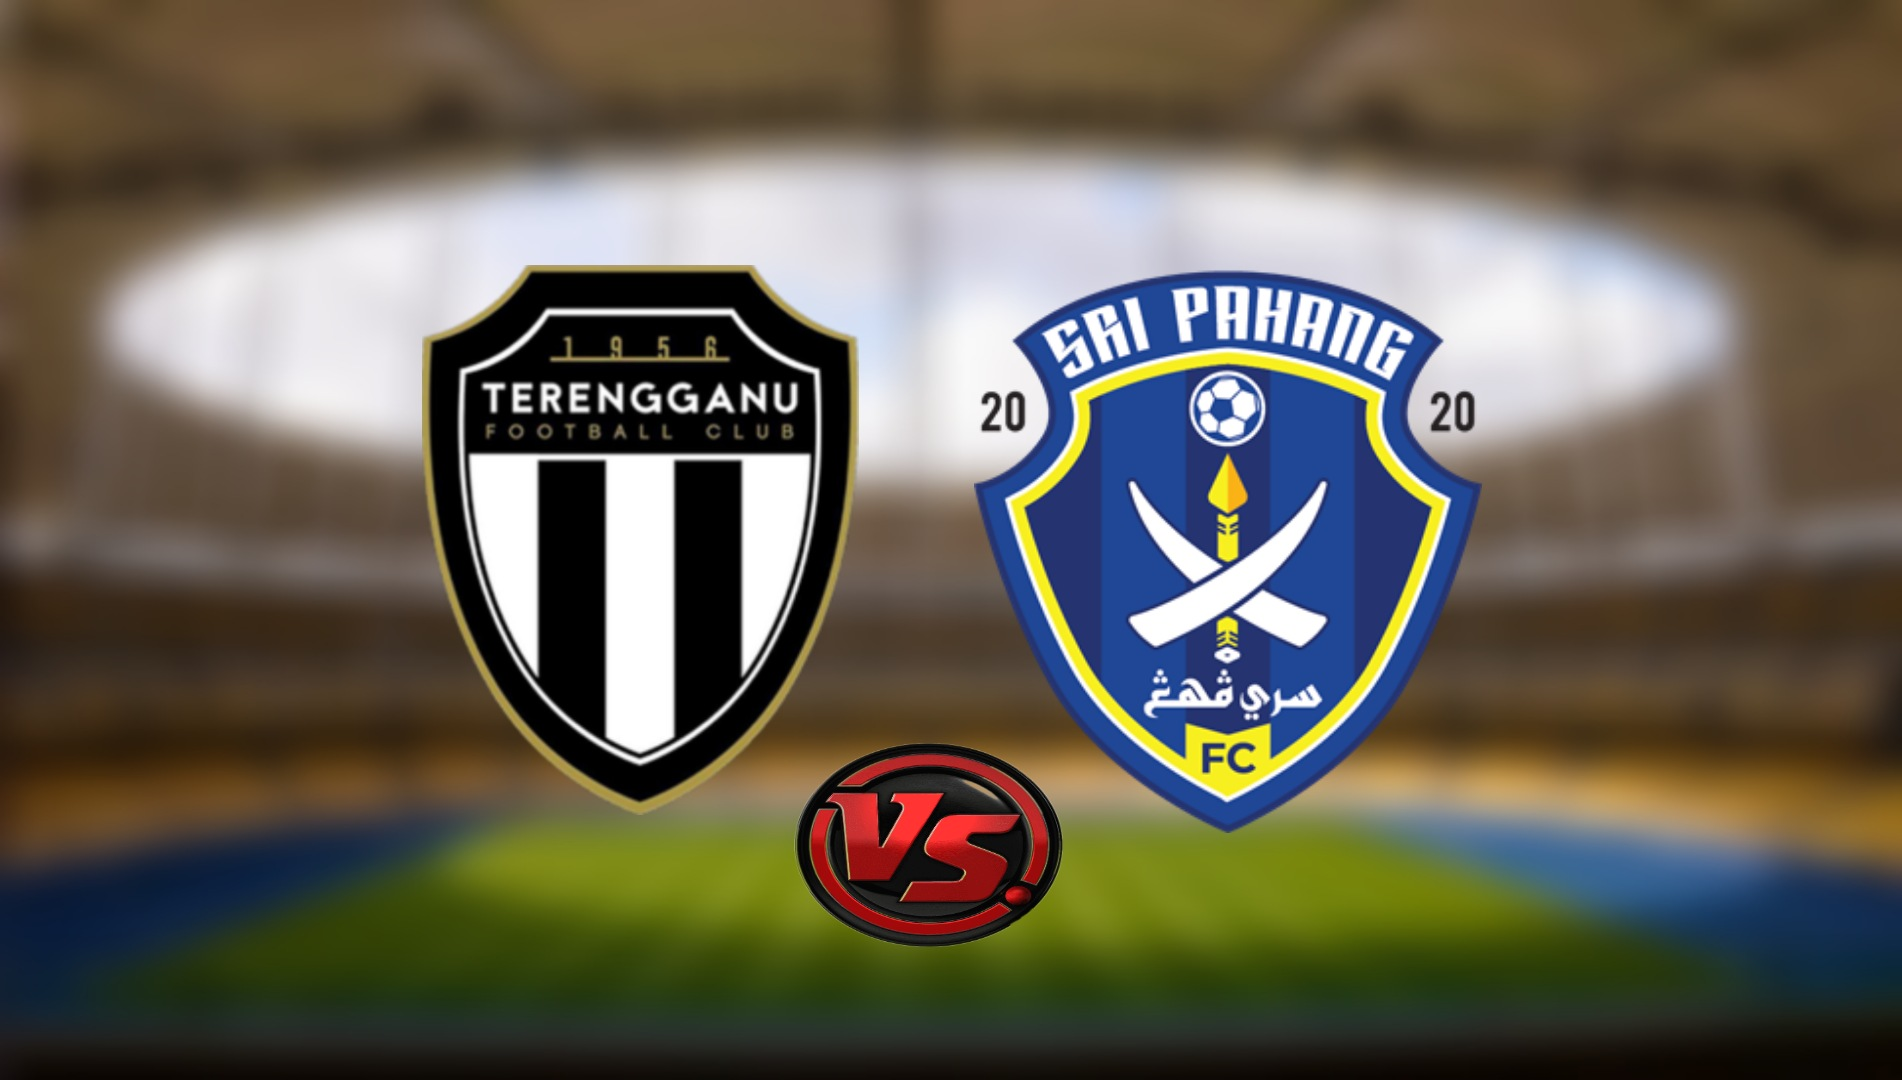 Live Streaming Terengganu FC vs Sri Pahang FC Liga Super 7.8.2021